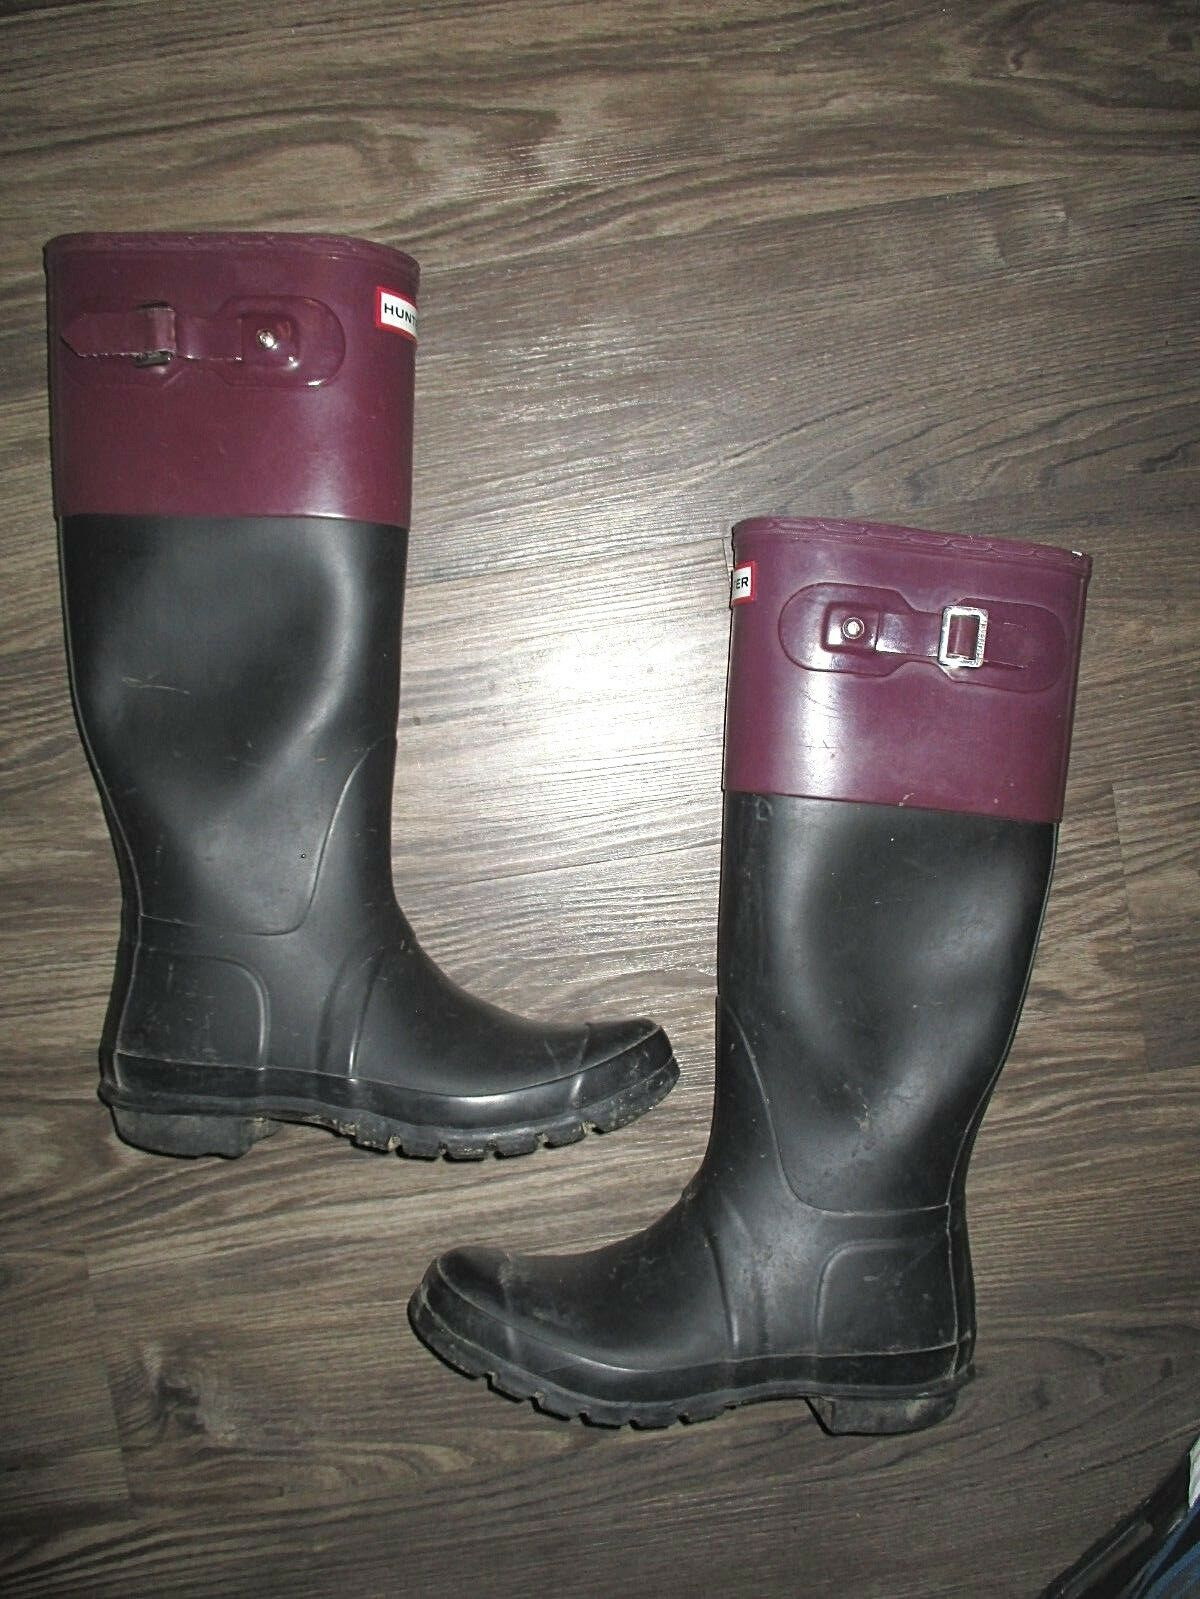 Hunter Tall schwarz and lila (Größe 9)  Wellington strap rain Stiefel